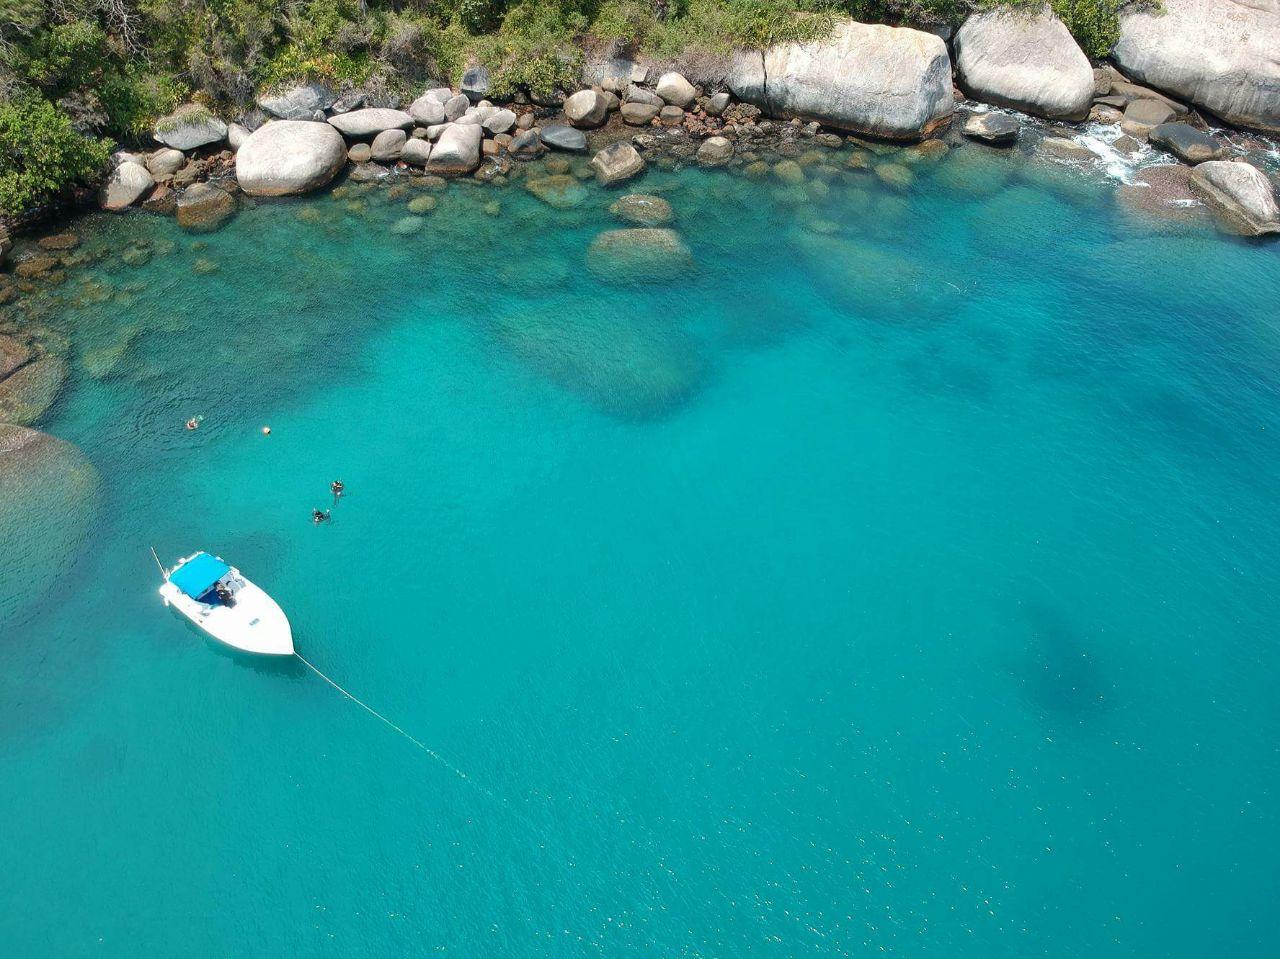 Meros Island - Top view